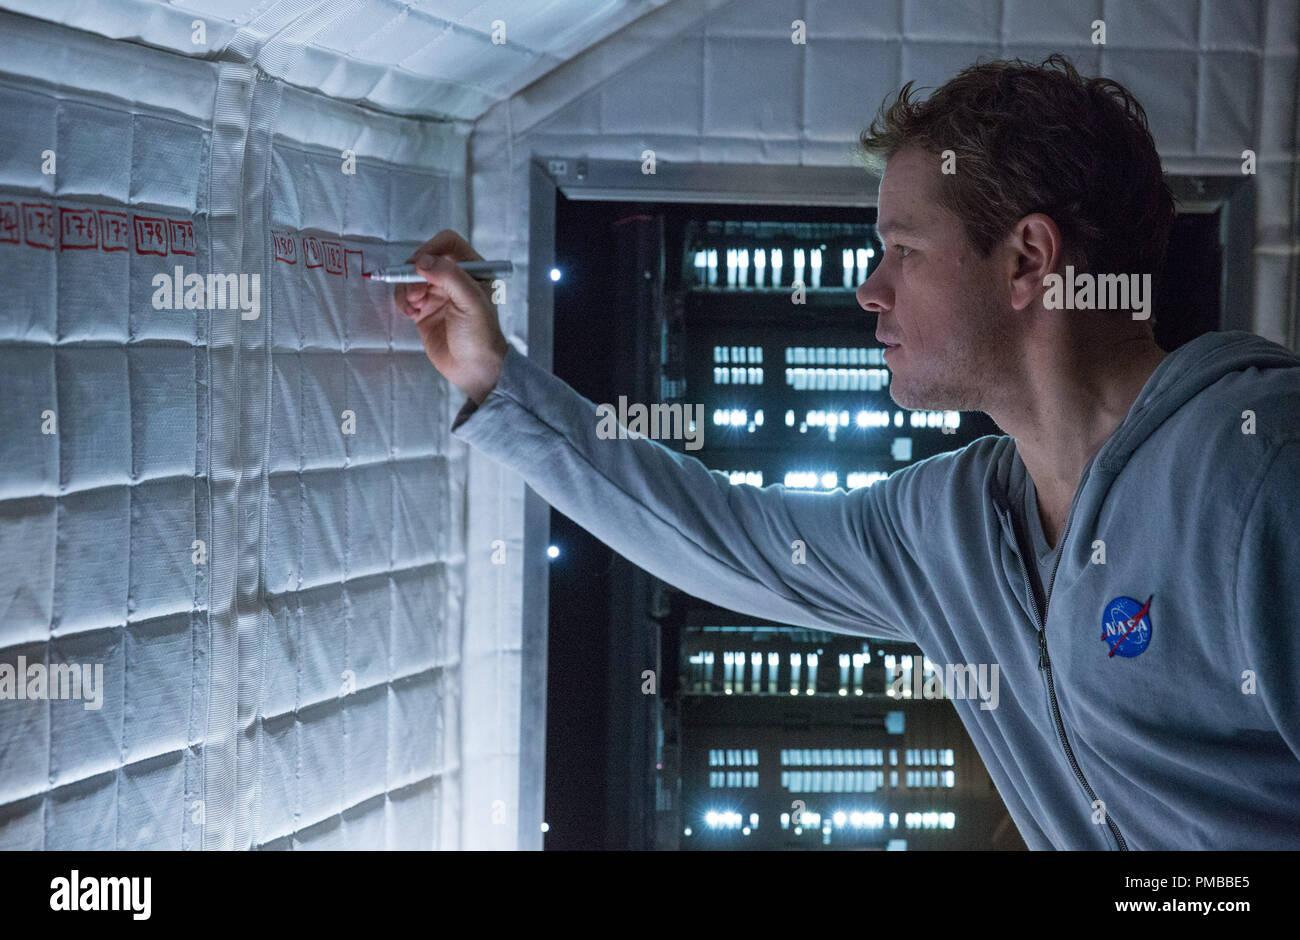 Matt Damon Portrays An Astronaut Who Must Draw Upon His Ingenuity To